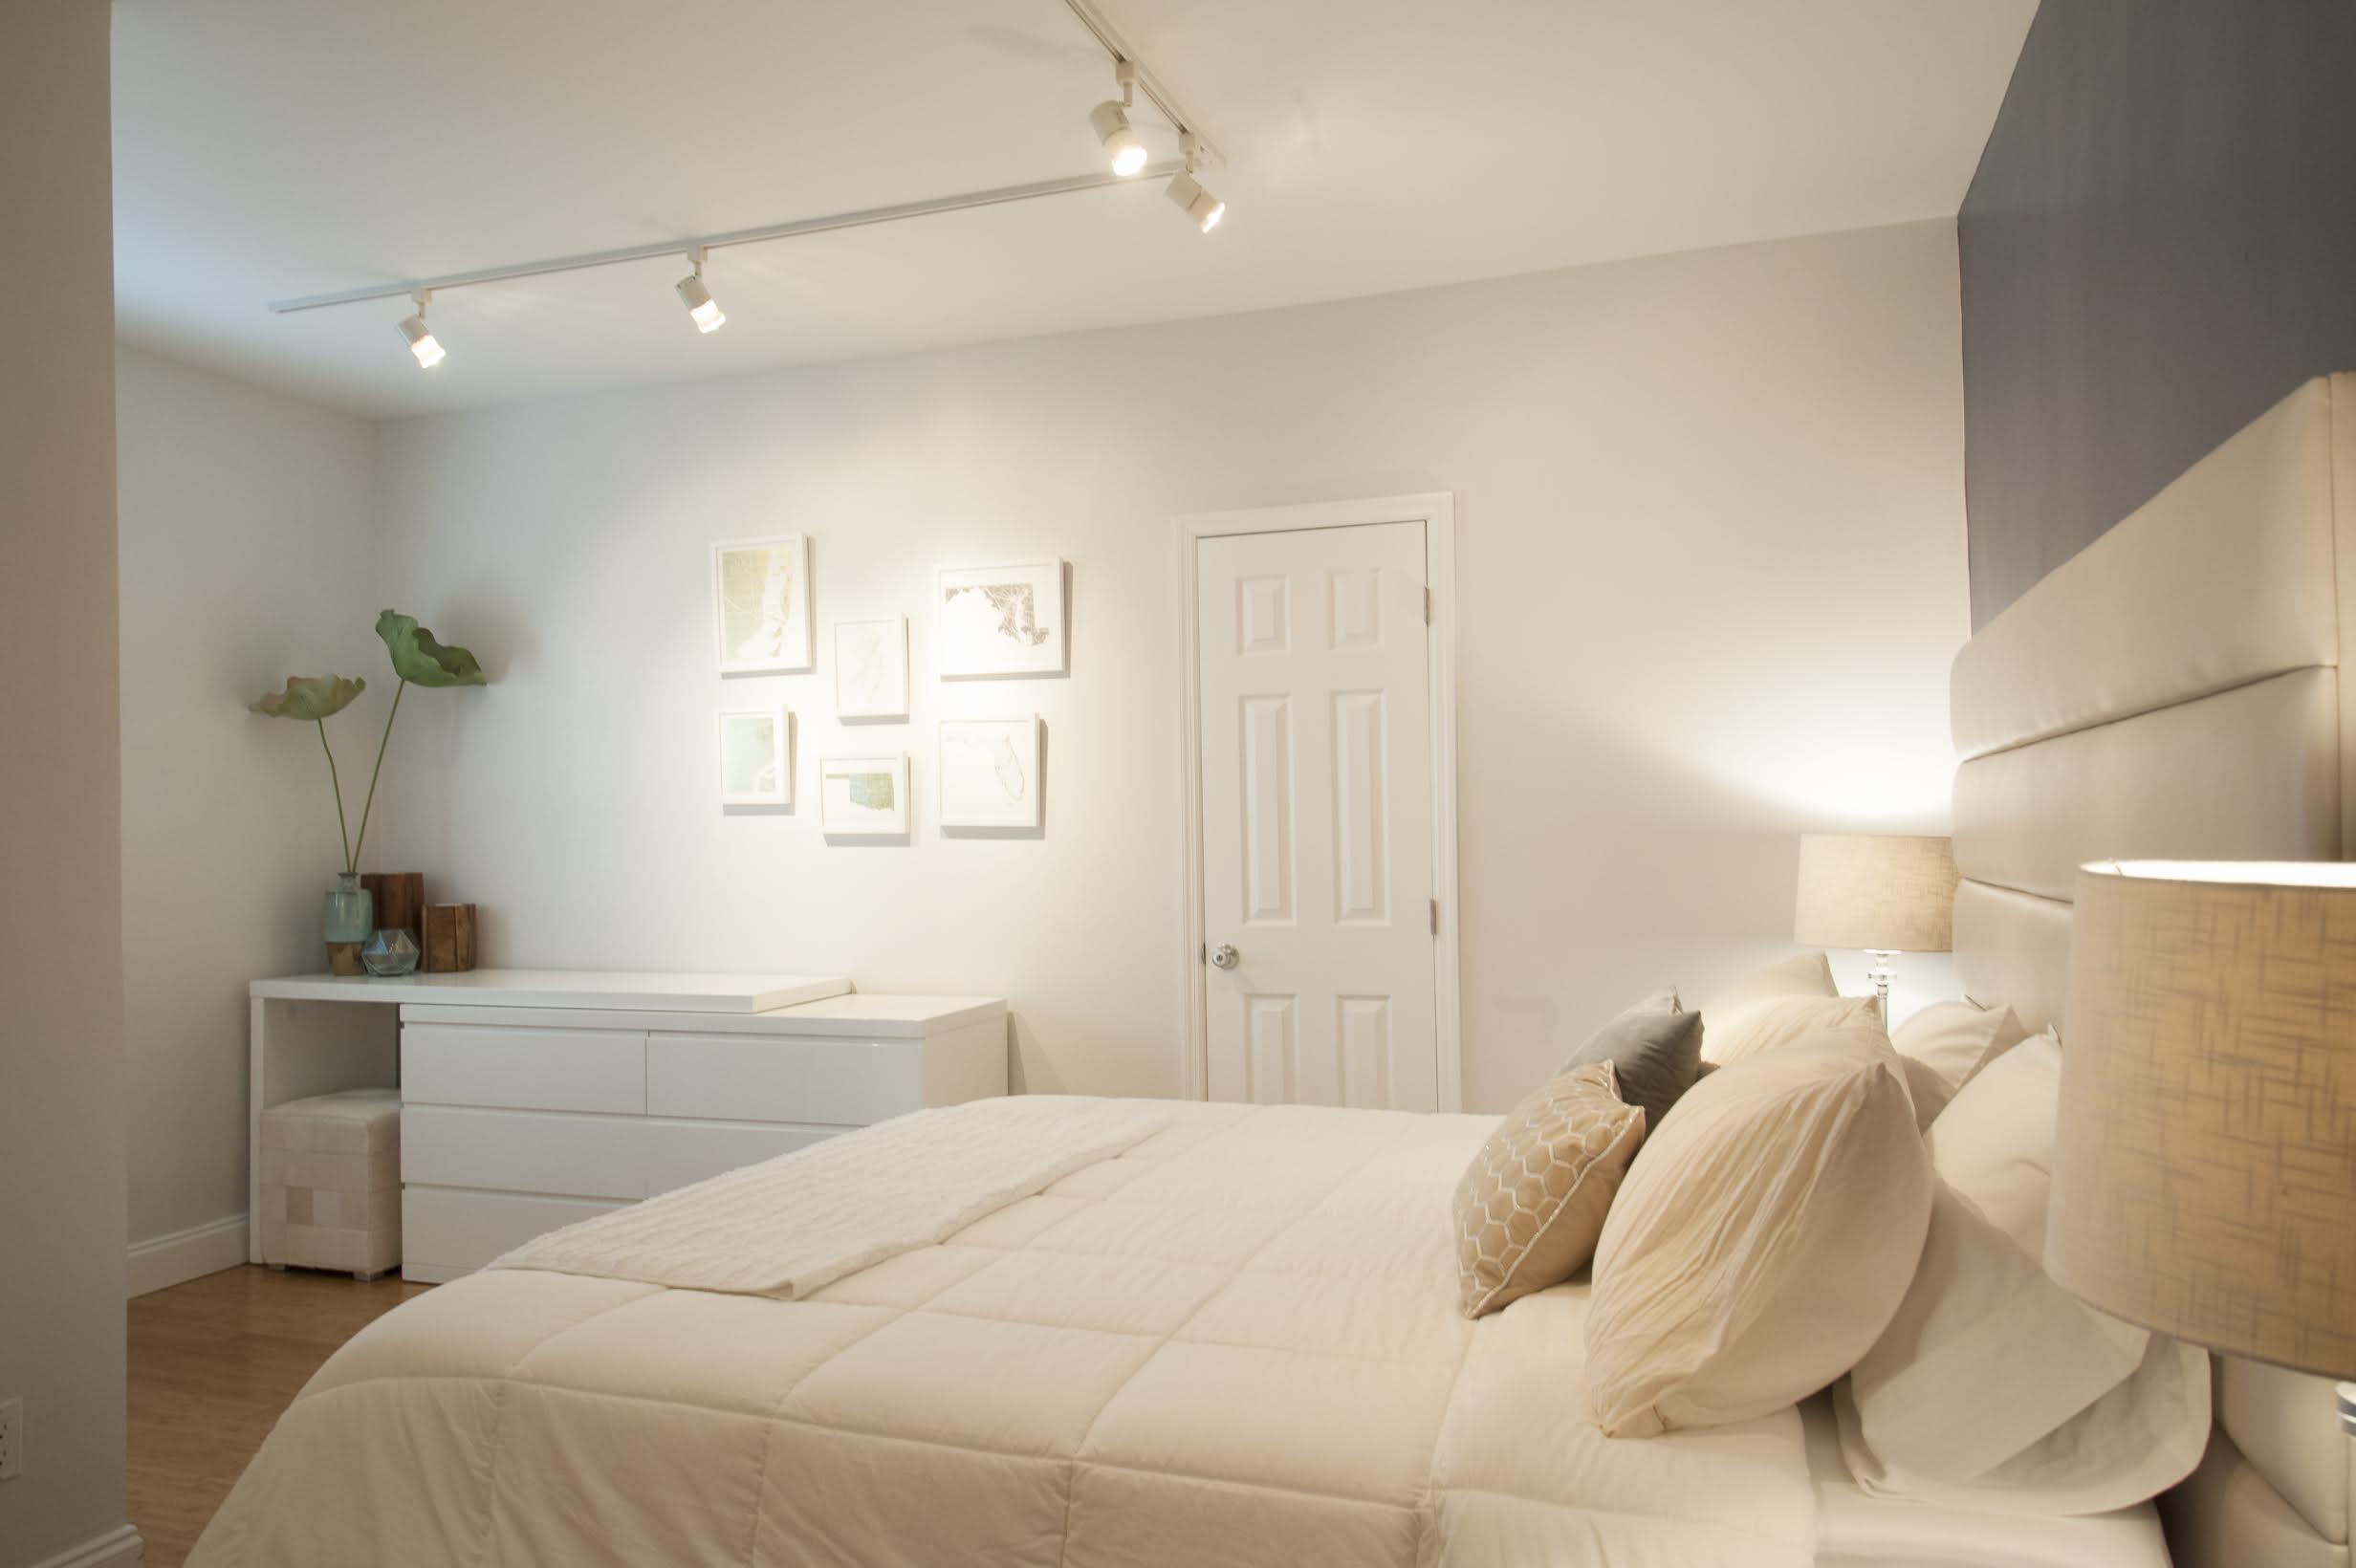 Modern Home Design Imports Motif - Home Decorating Inspiration ...